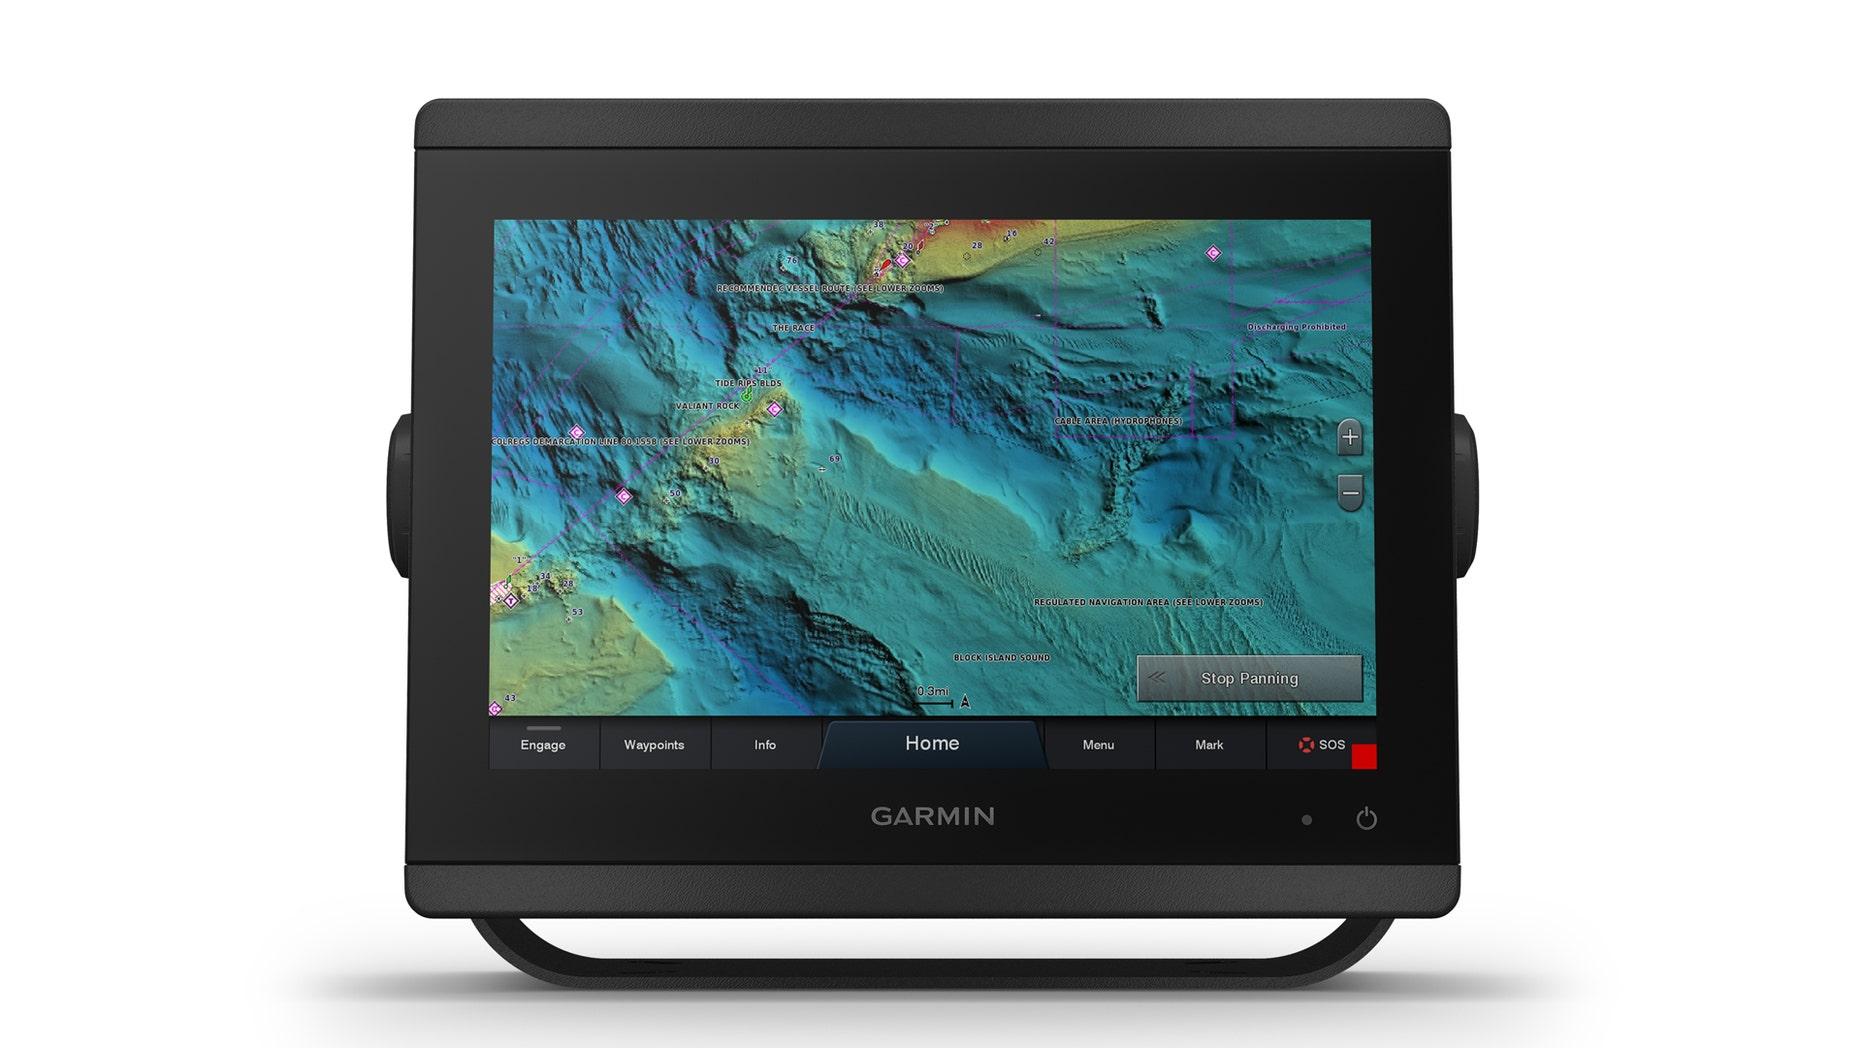 File photo: Garmin GPS. (Photo: Business Wire)